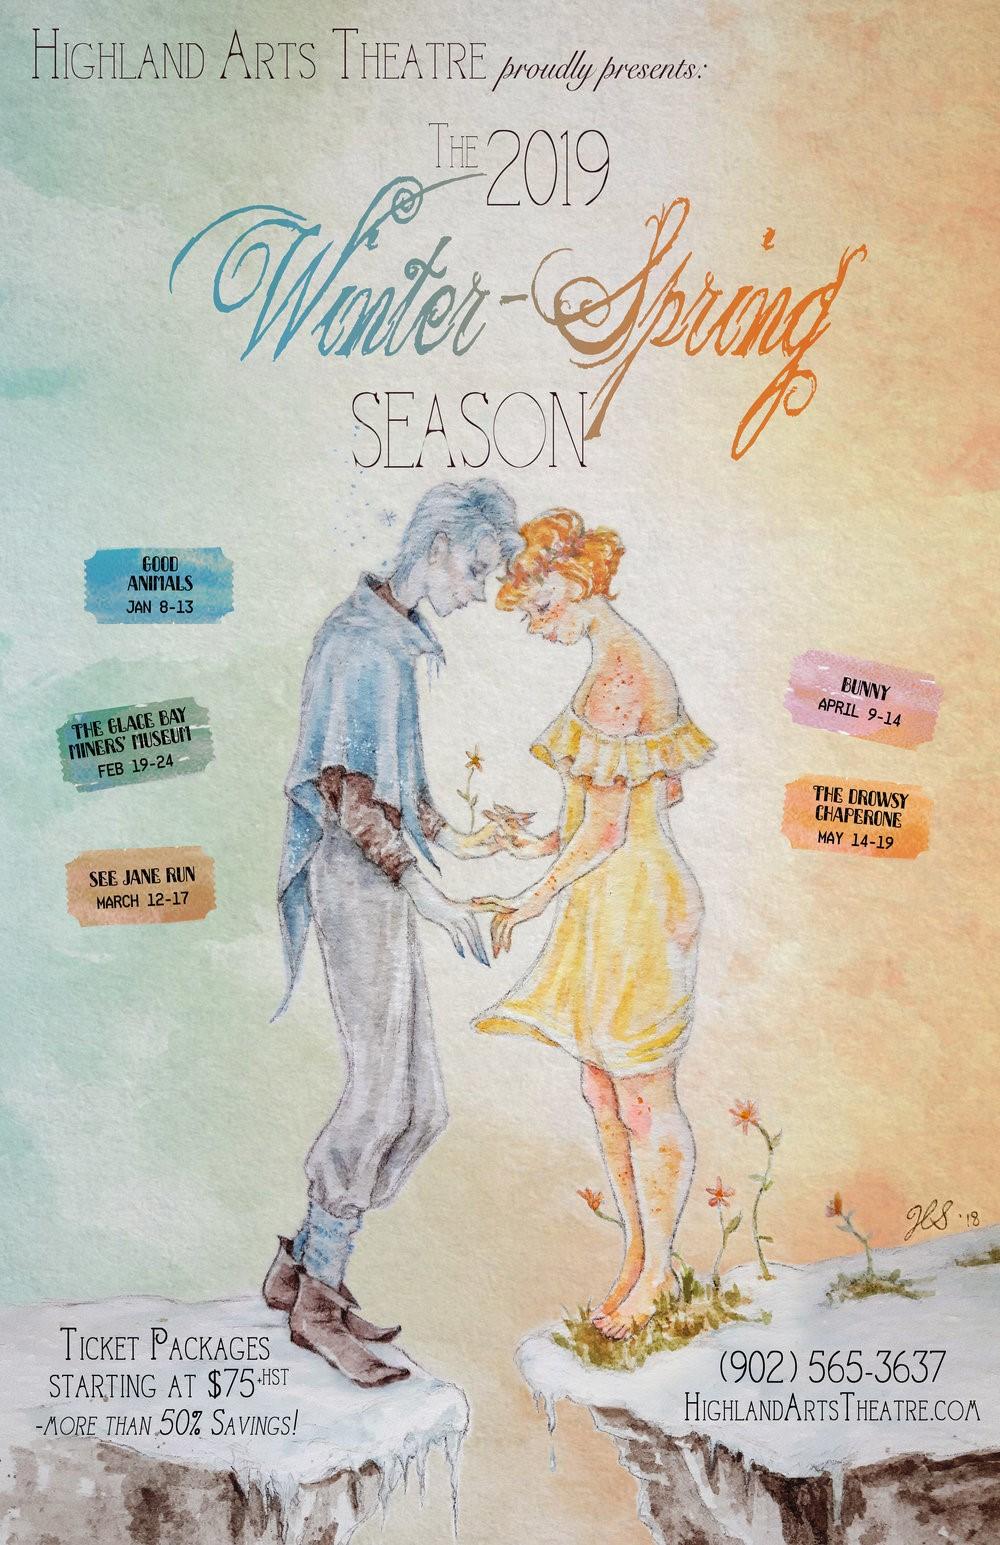 HAT 2019 Winter-Spring Season Passes Now On Sale